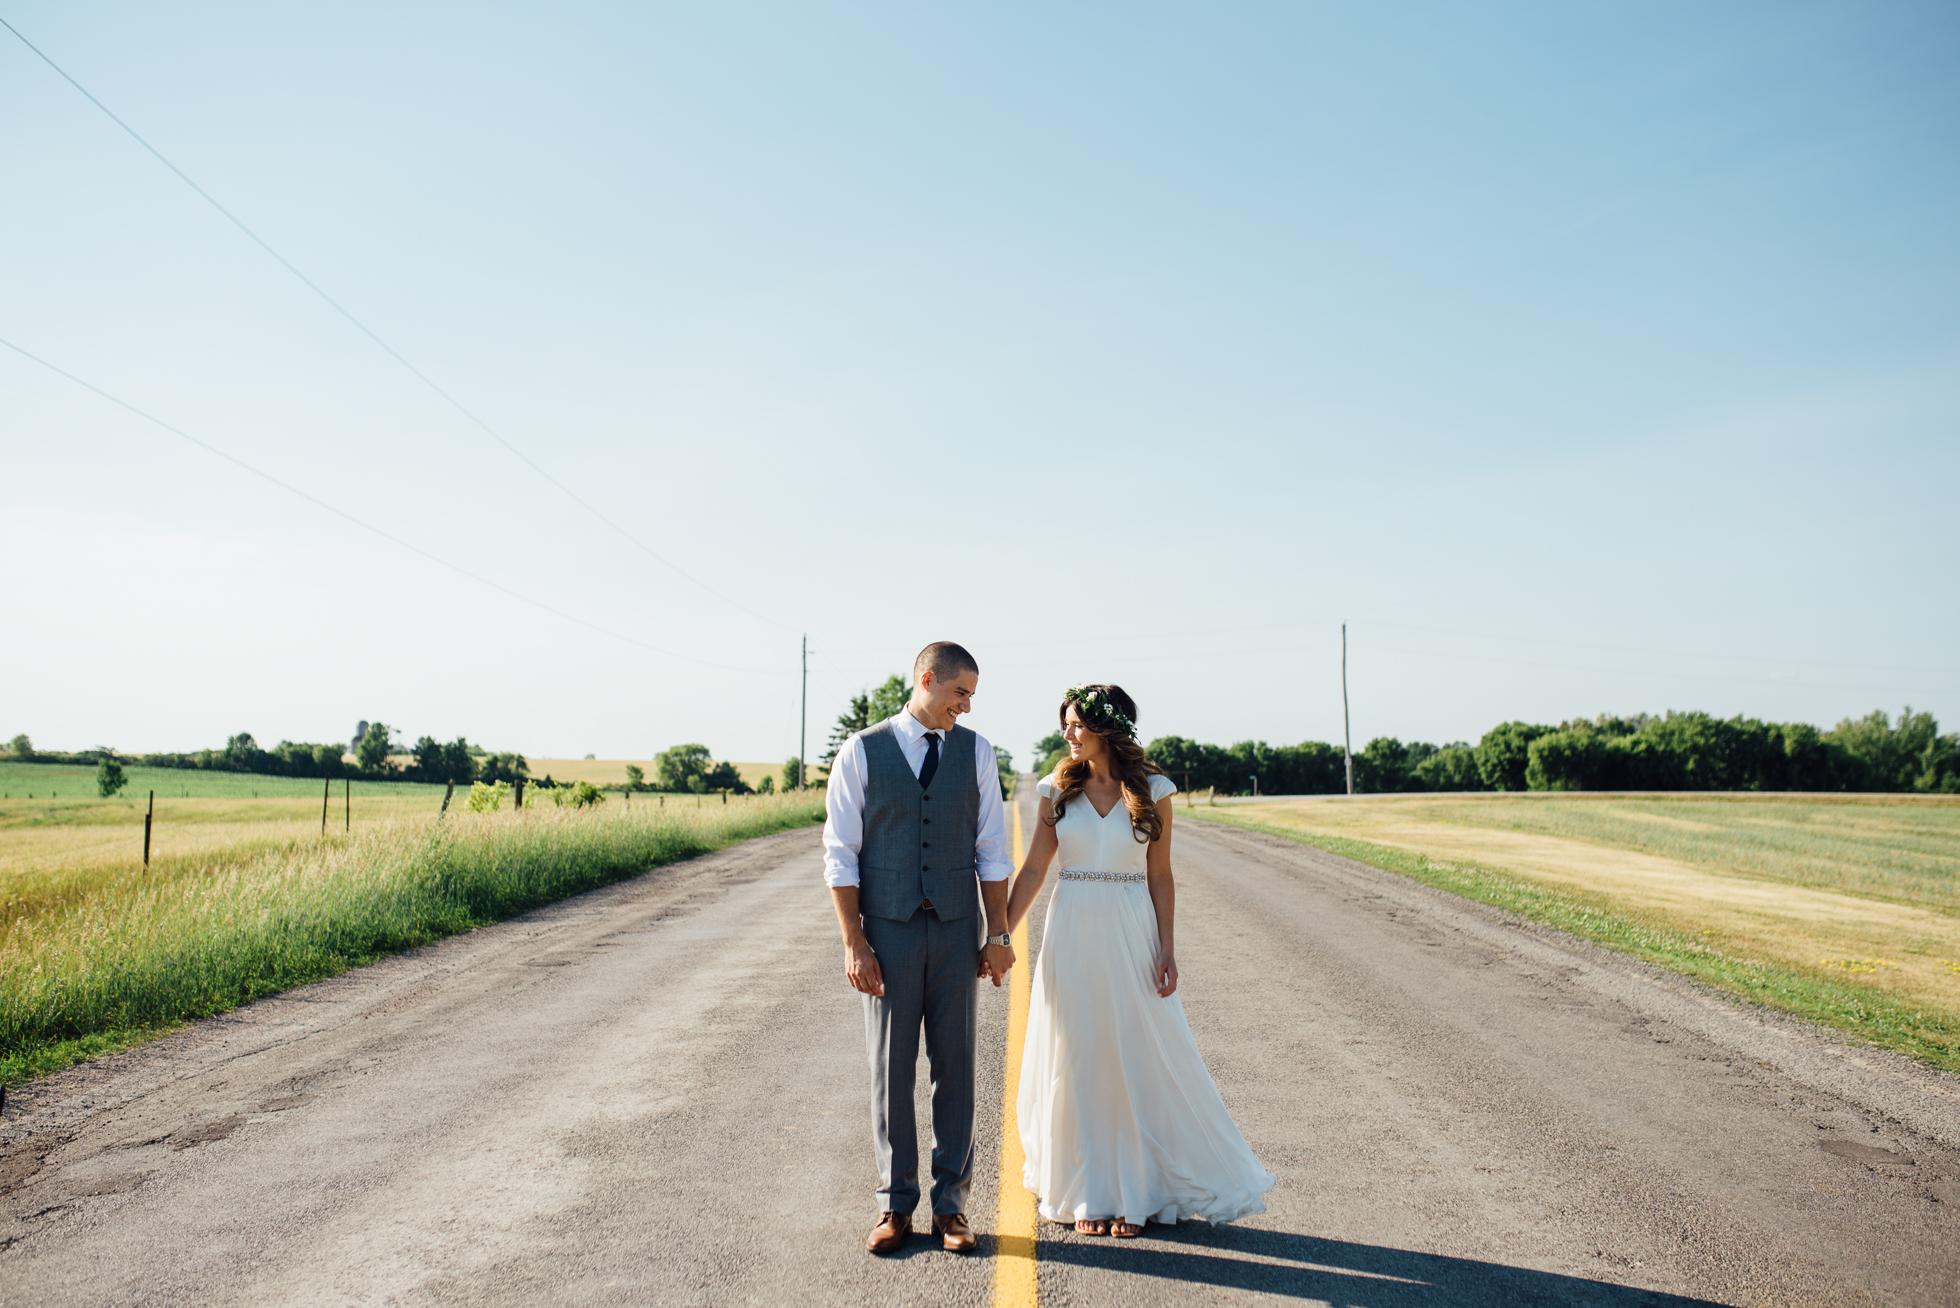 Downswell-Barn-Wedding-Photography-79.jpg